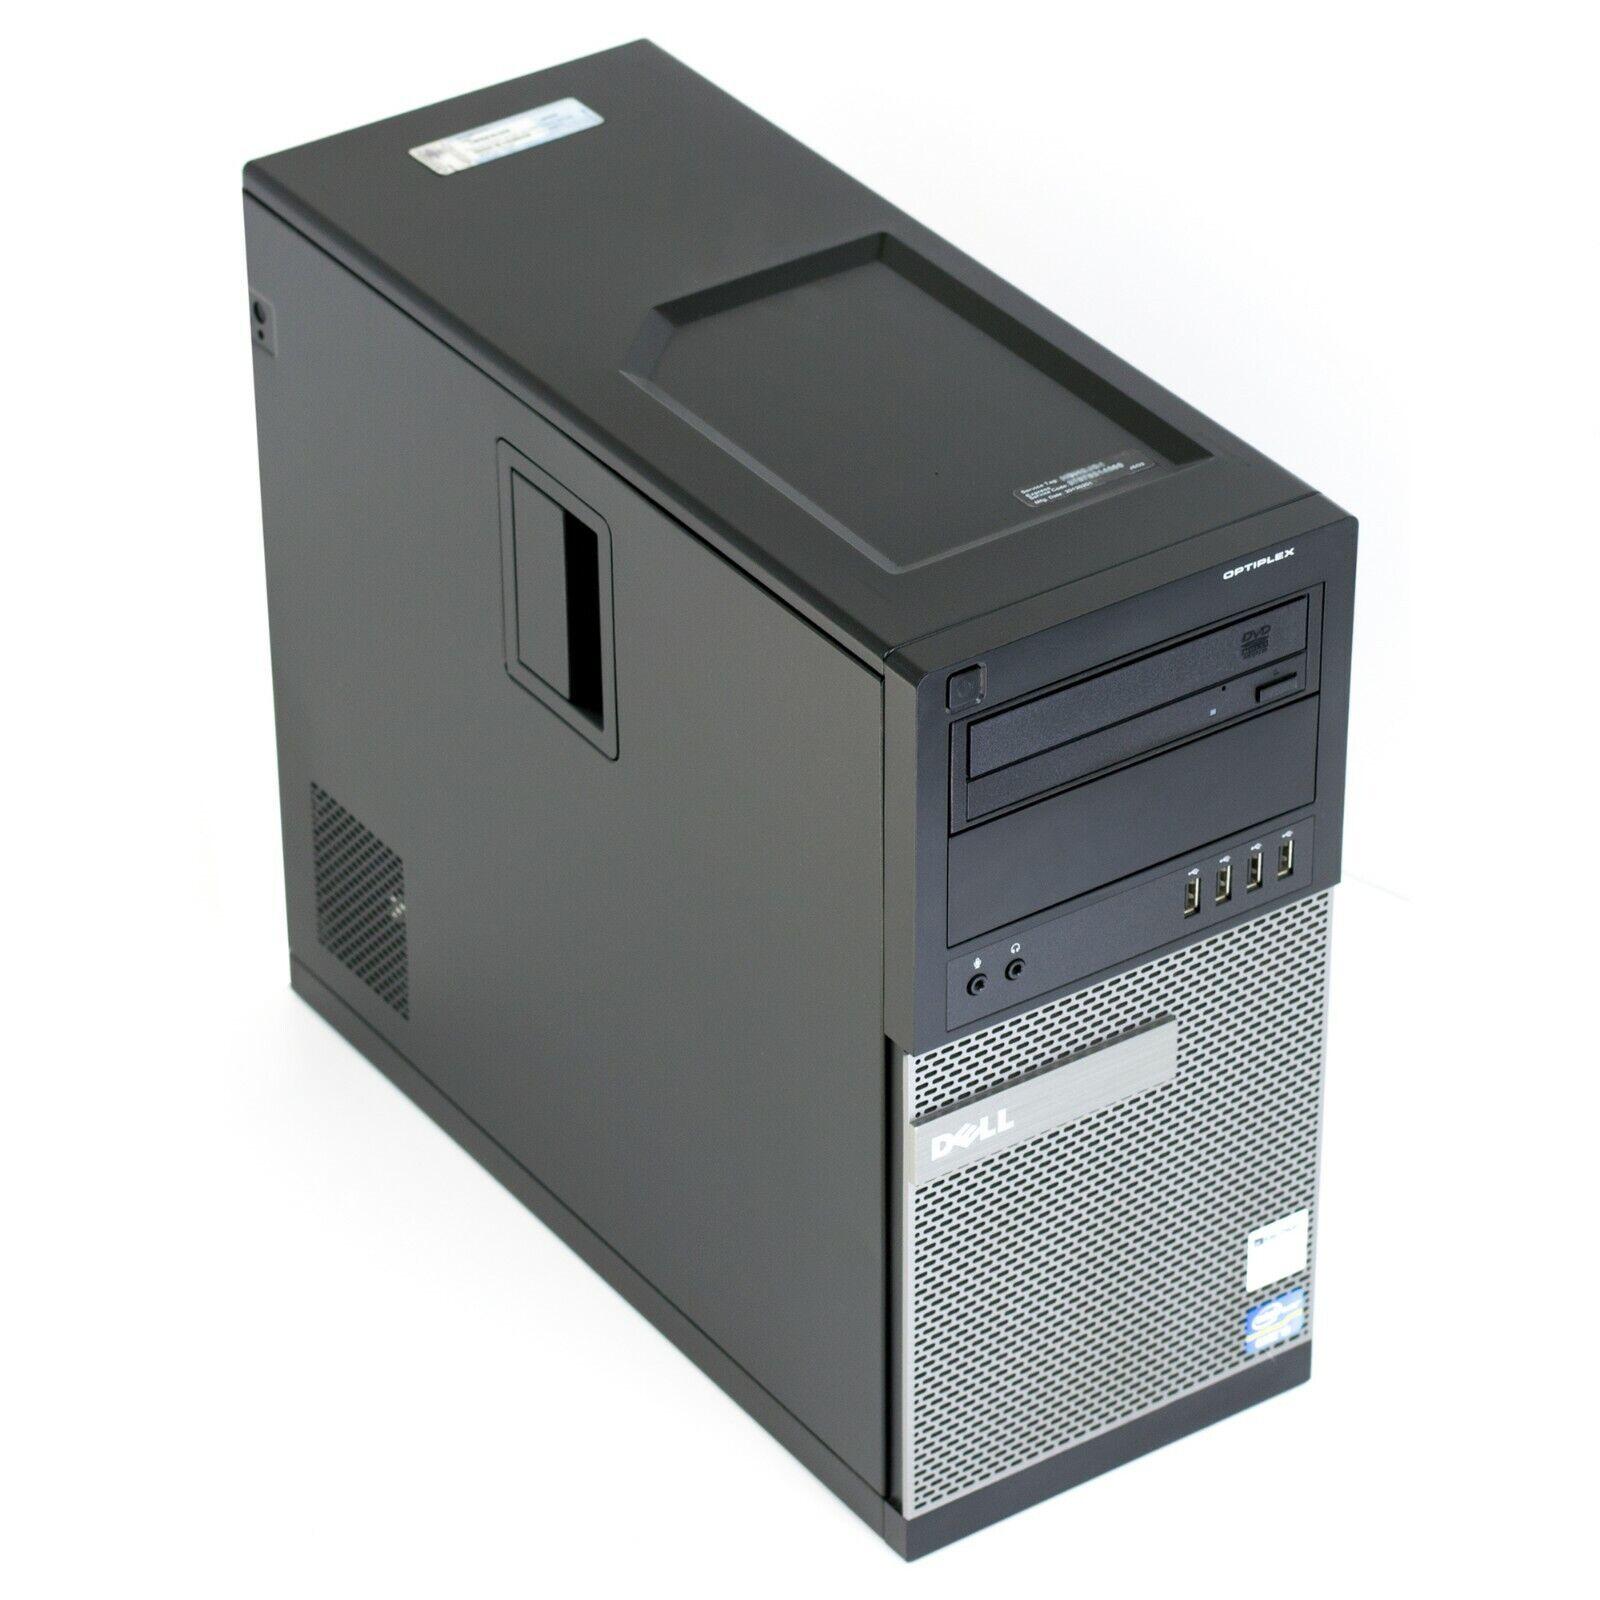 Dell OptiPlex 9010 MT  i5-3470 3.20 GHz 8GB RAM 240GB SSD. Buy it now for 155.00